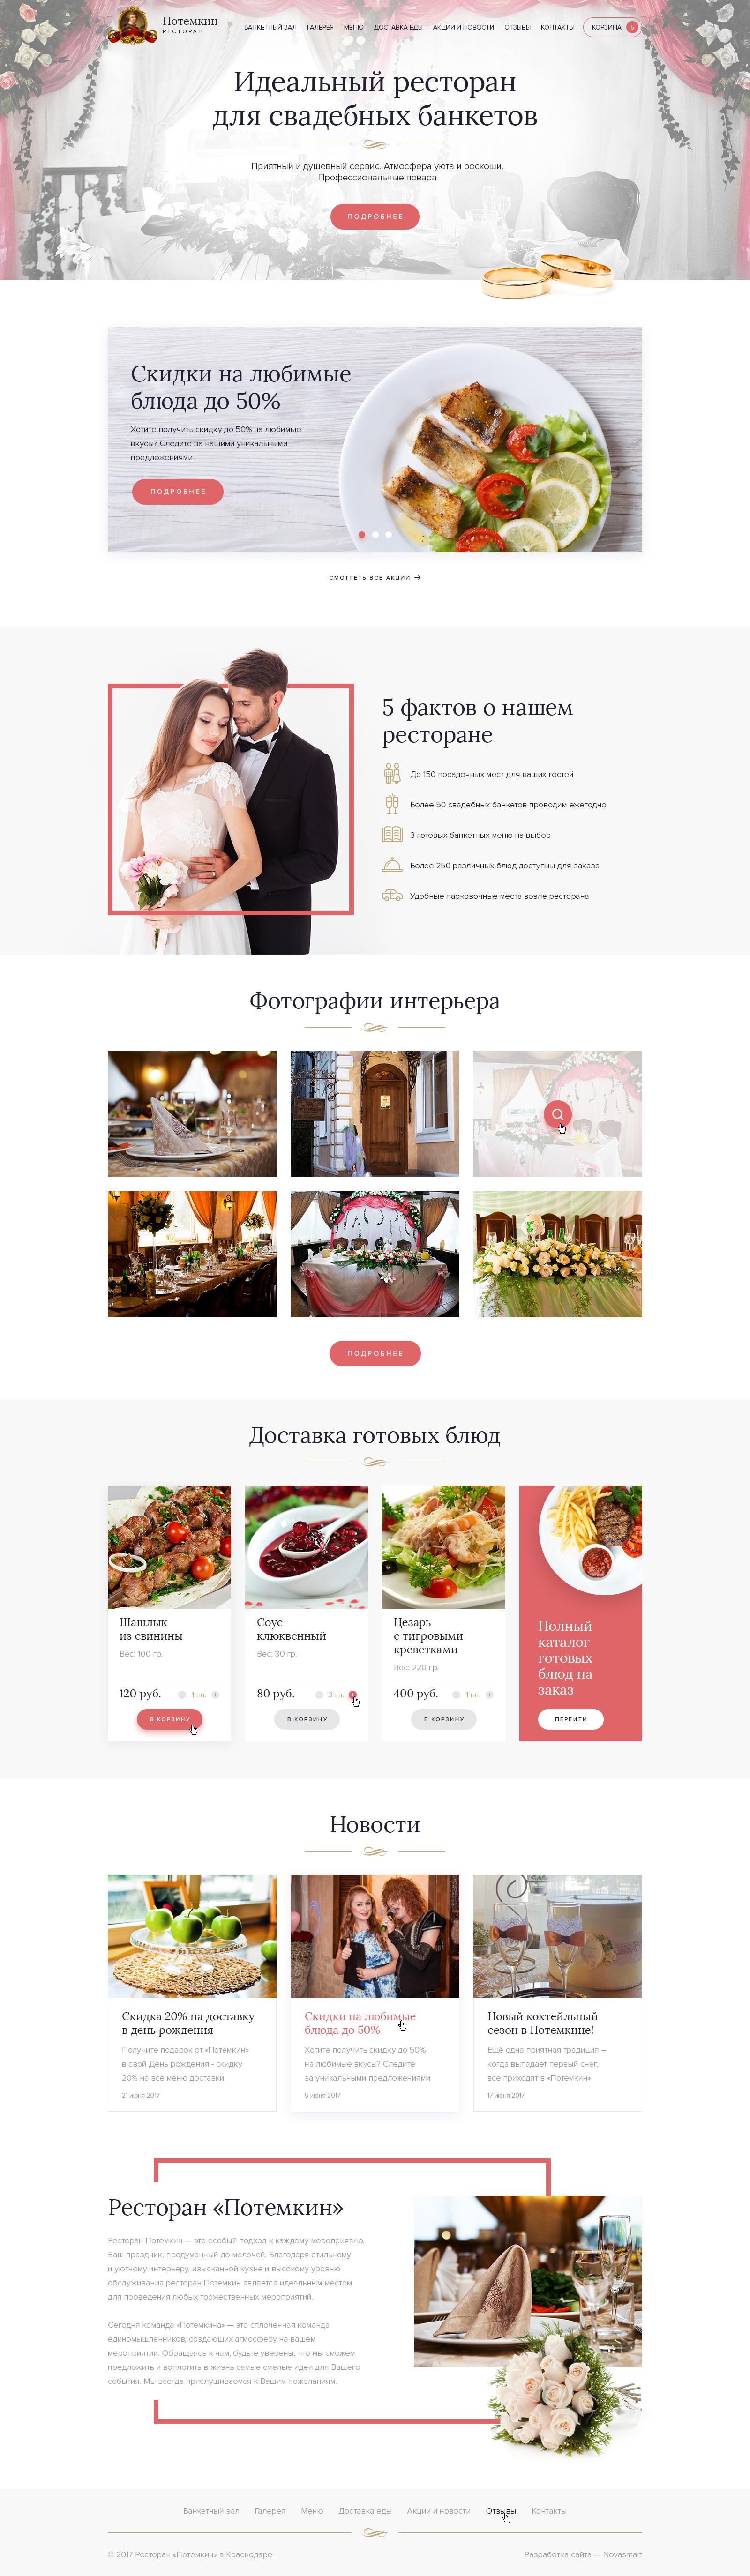 Ресторан «Потемкин»